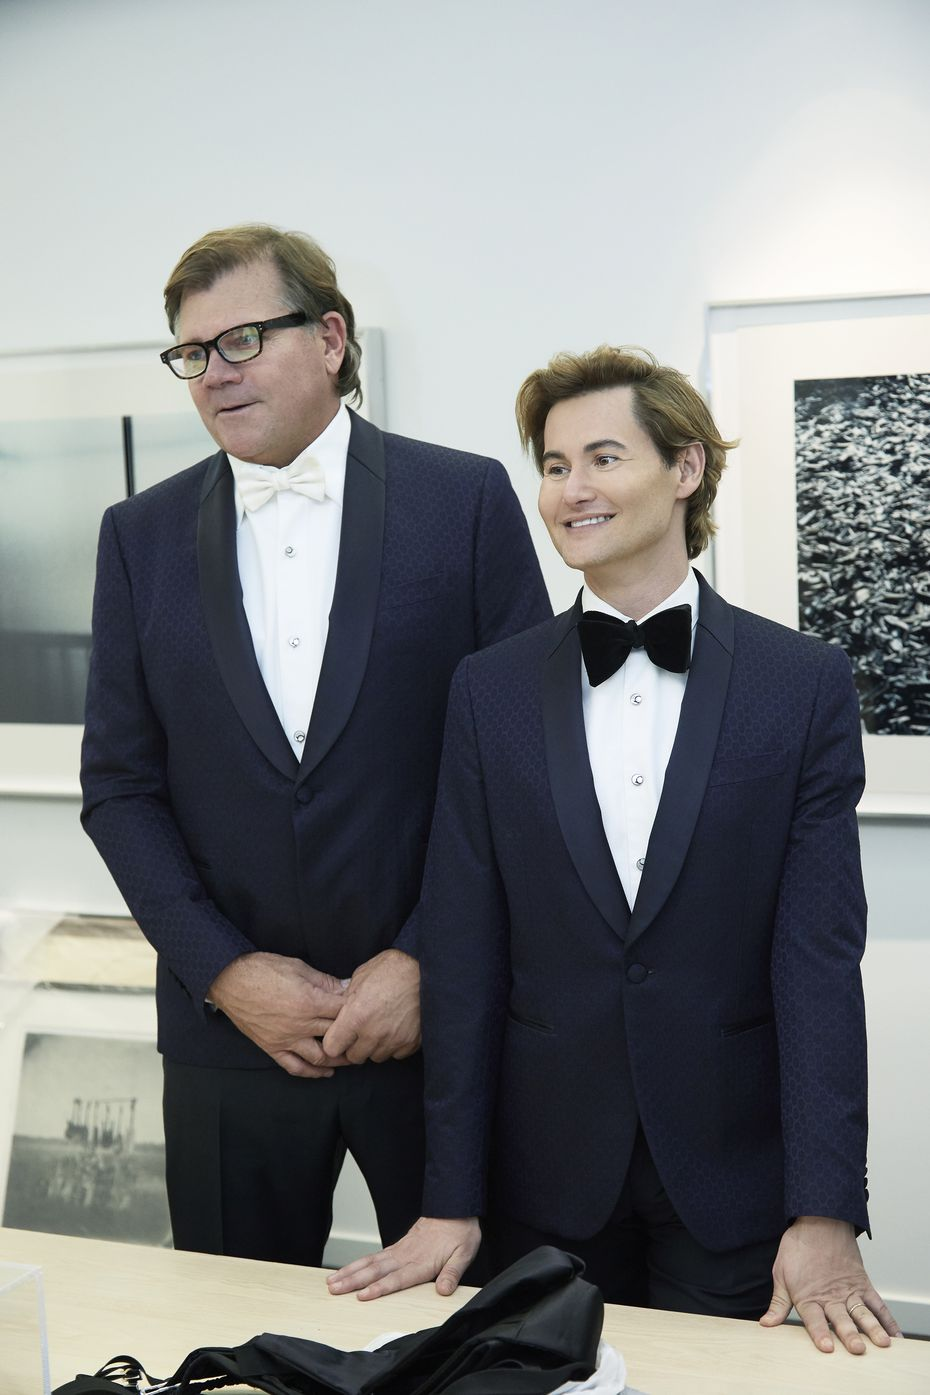 The couple during their tuxedo fitting. Each wore Salvatore Ferragamo midnight blue tuxedos.